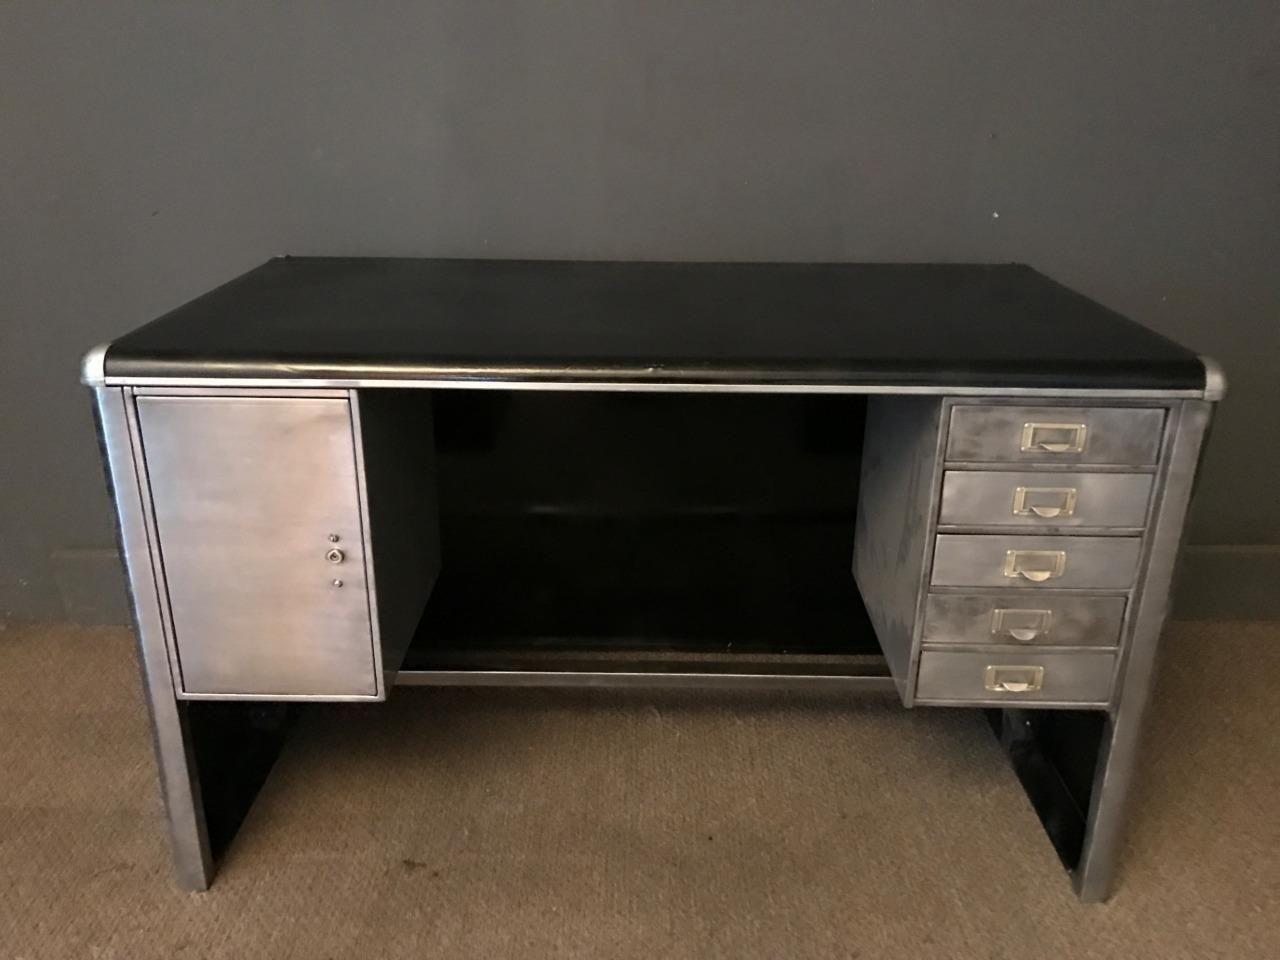 ebay office desks. STUNNING VINTAGE MID CENTURY STRIPPED METAL DESK OFFICE WITH KEY | EBay Ebay Office Desks E